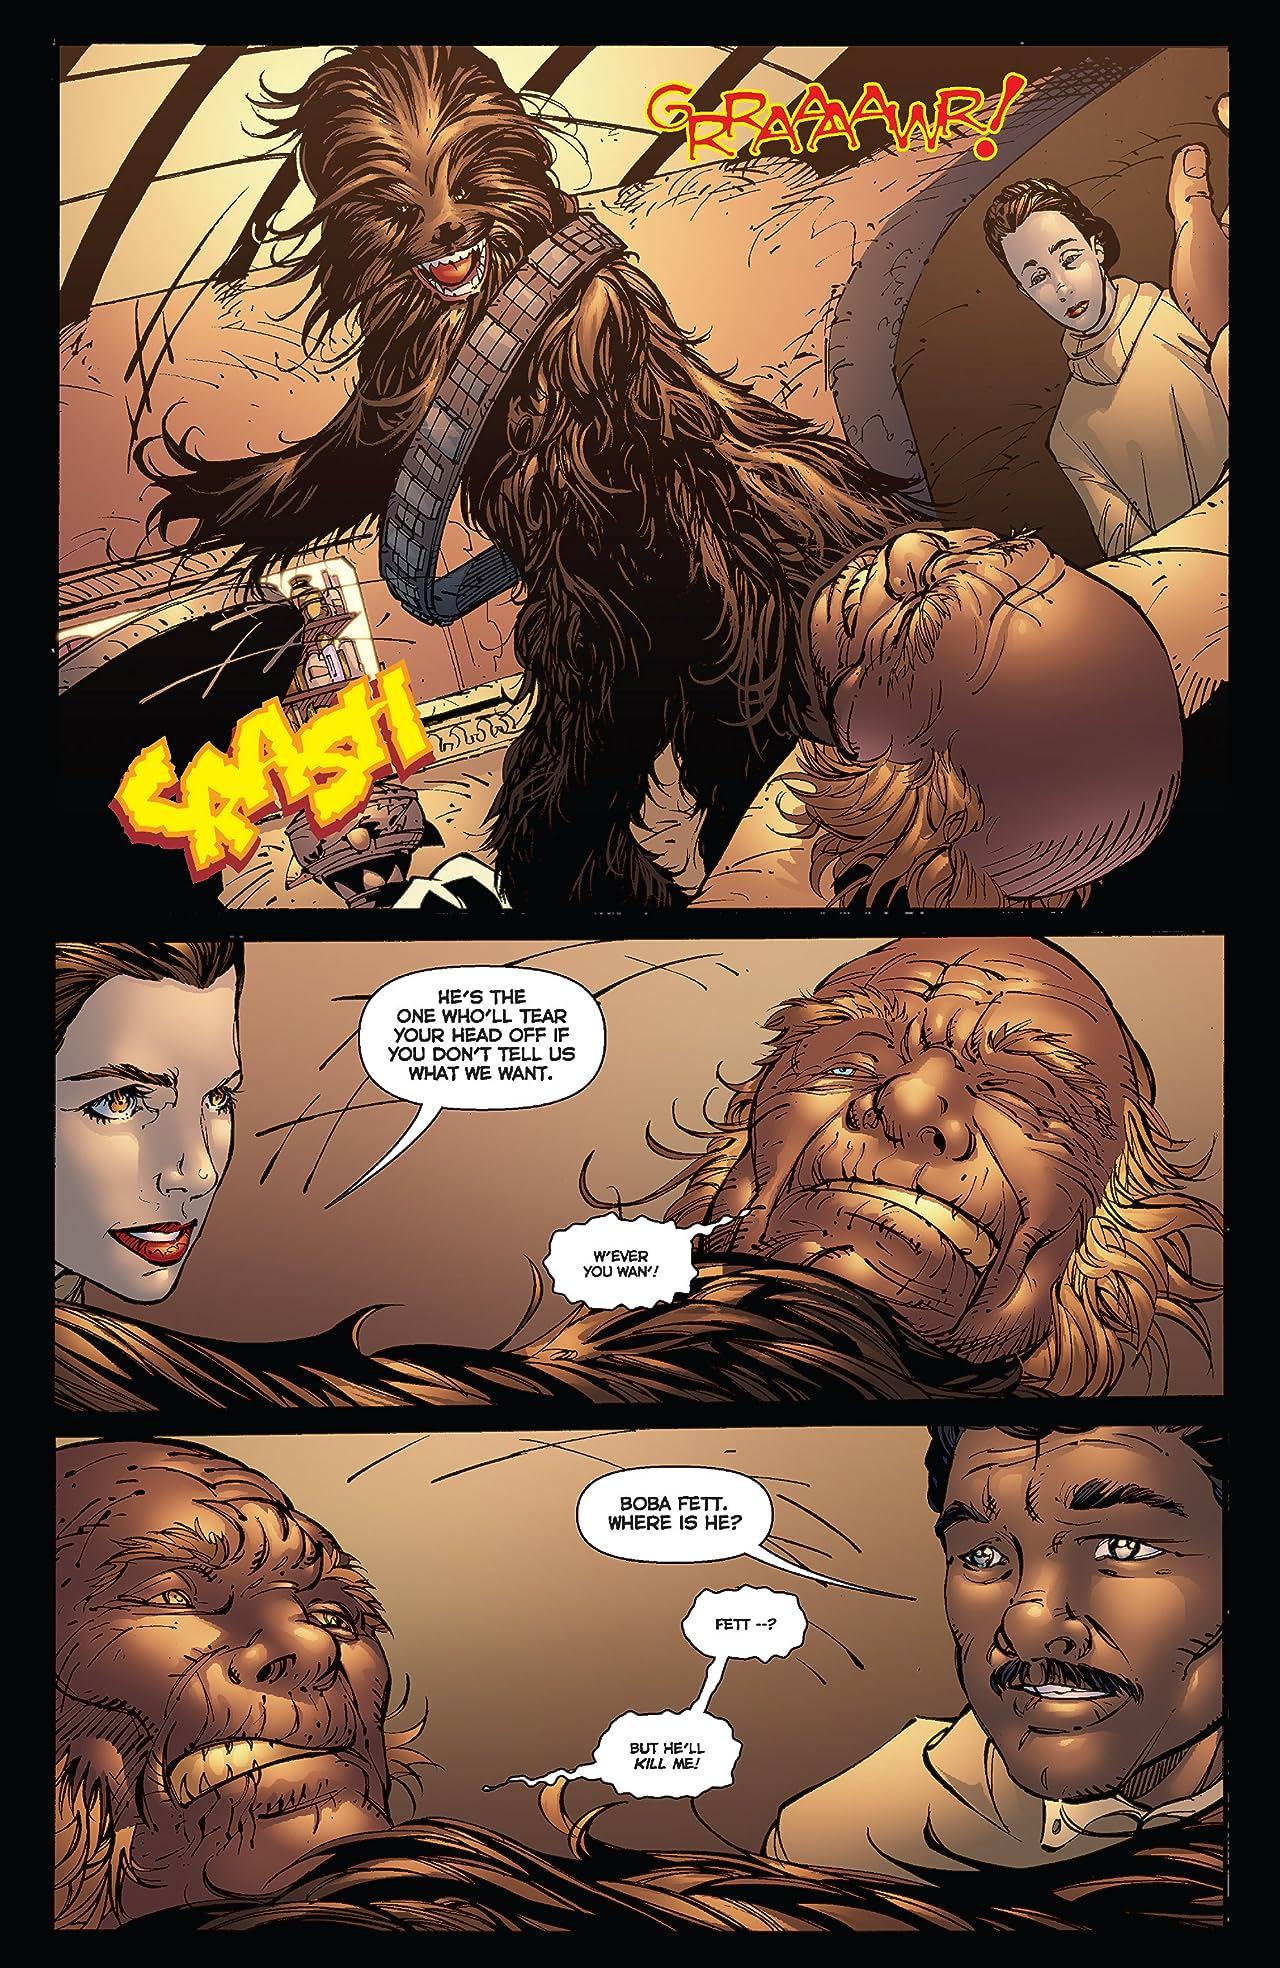 Star Wars Infinities: Return of the Jedi #2 (of 4)